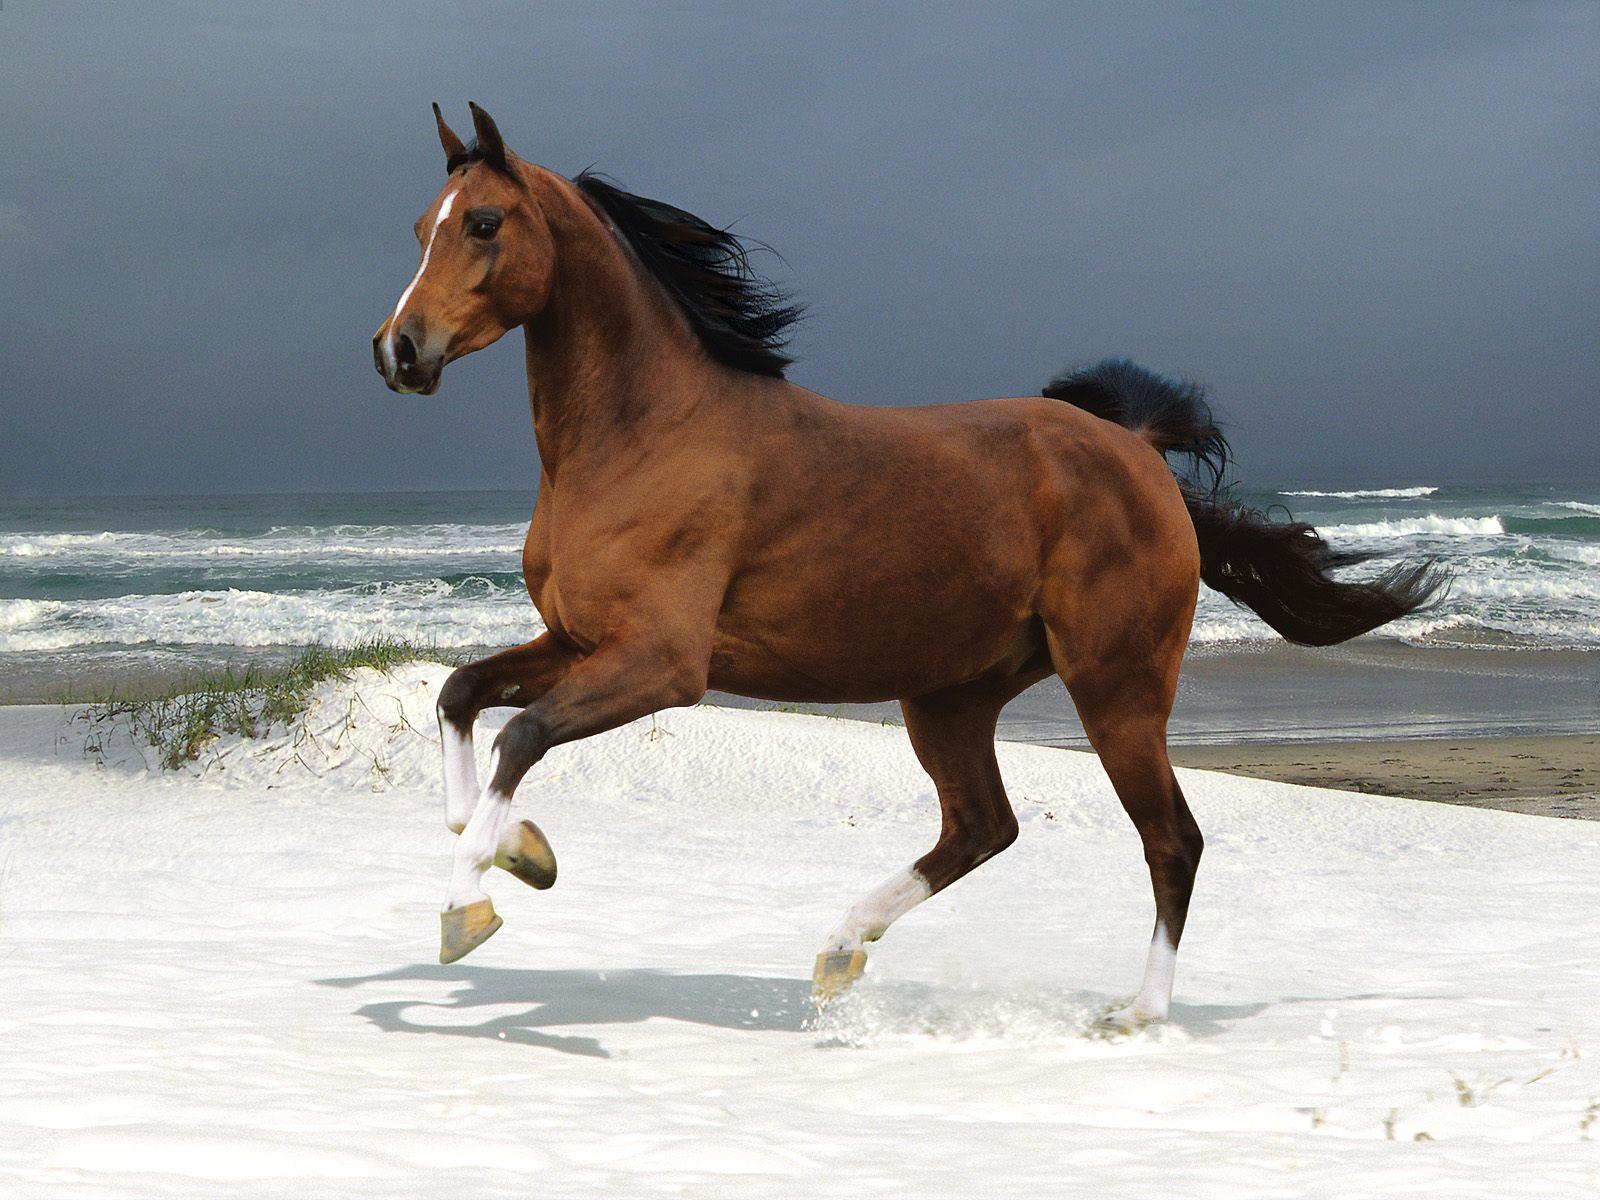 041 koně zvířata horses animals